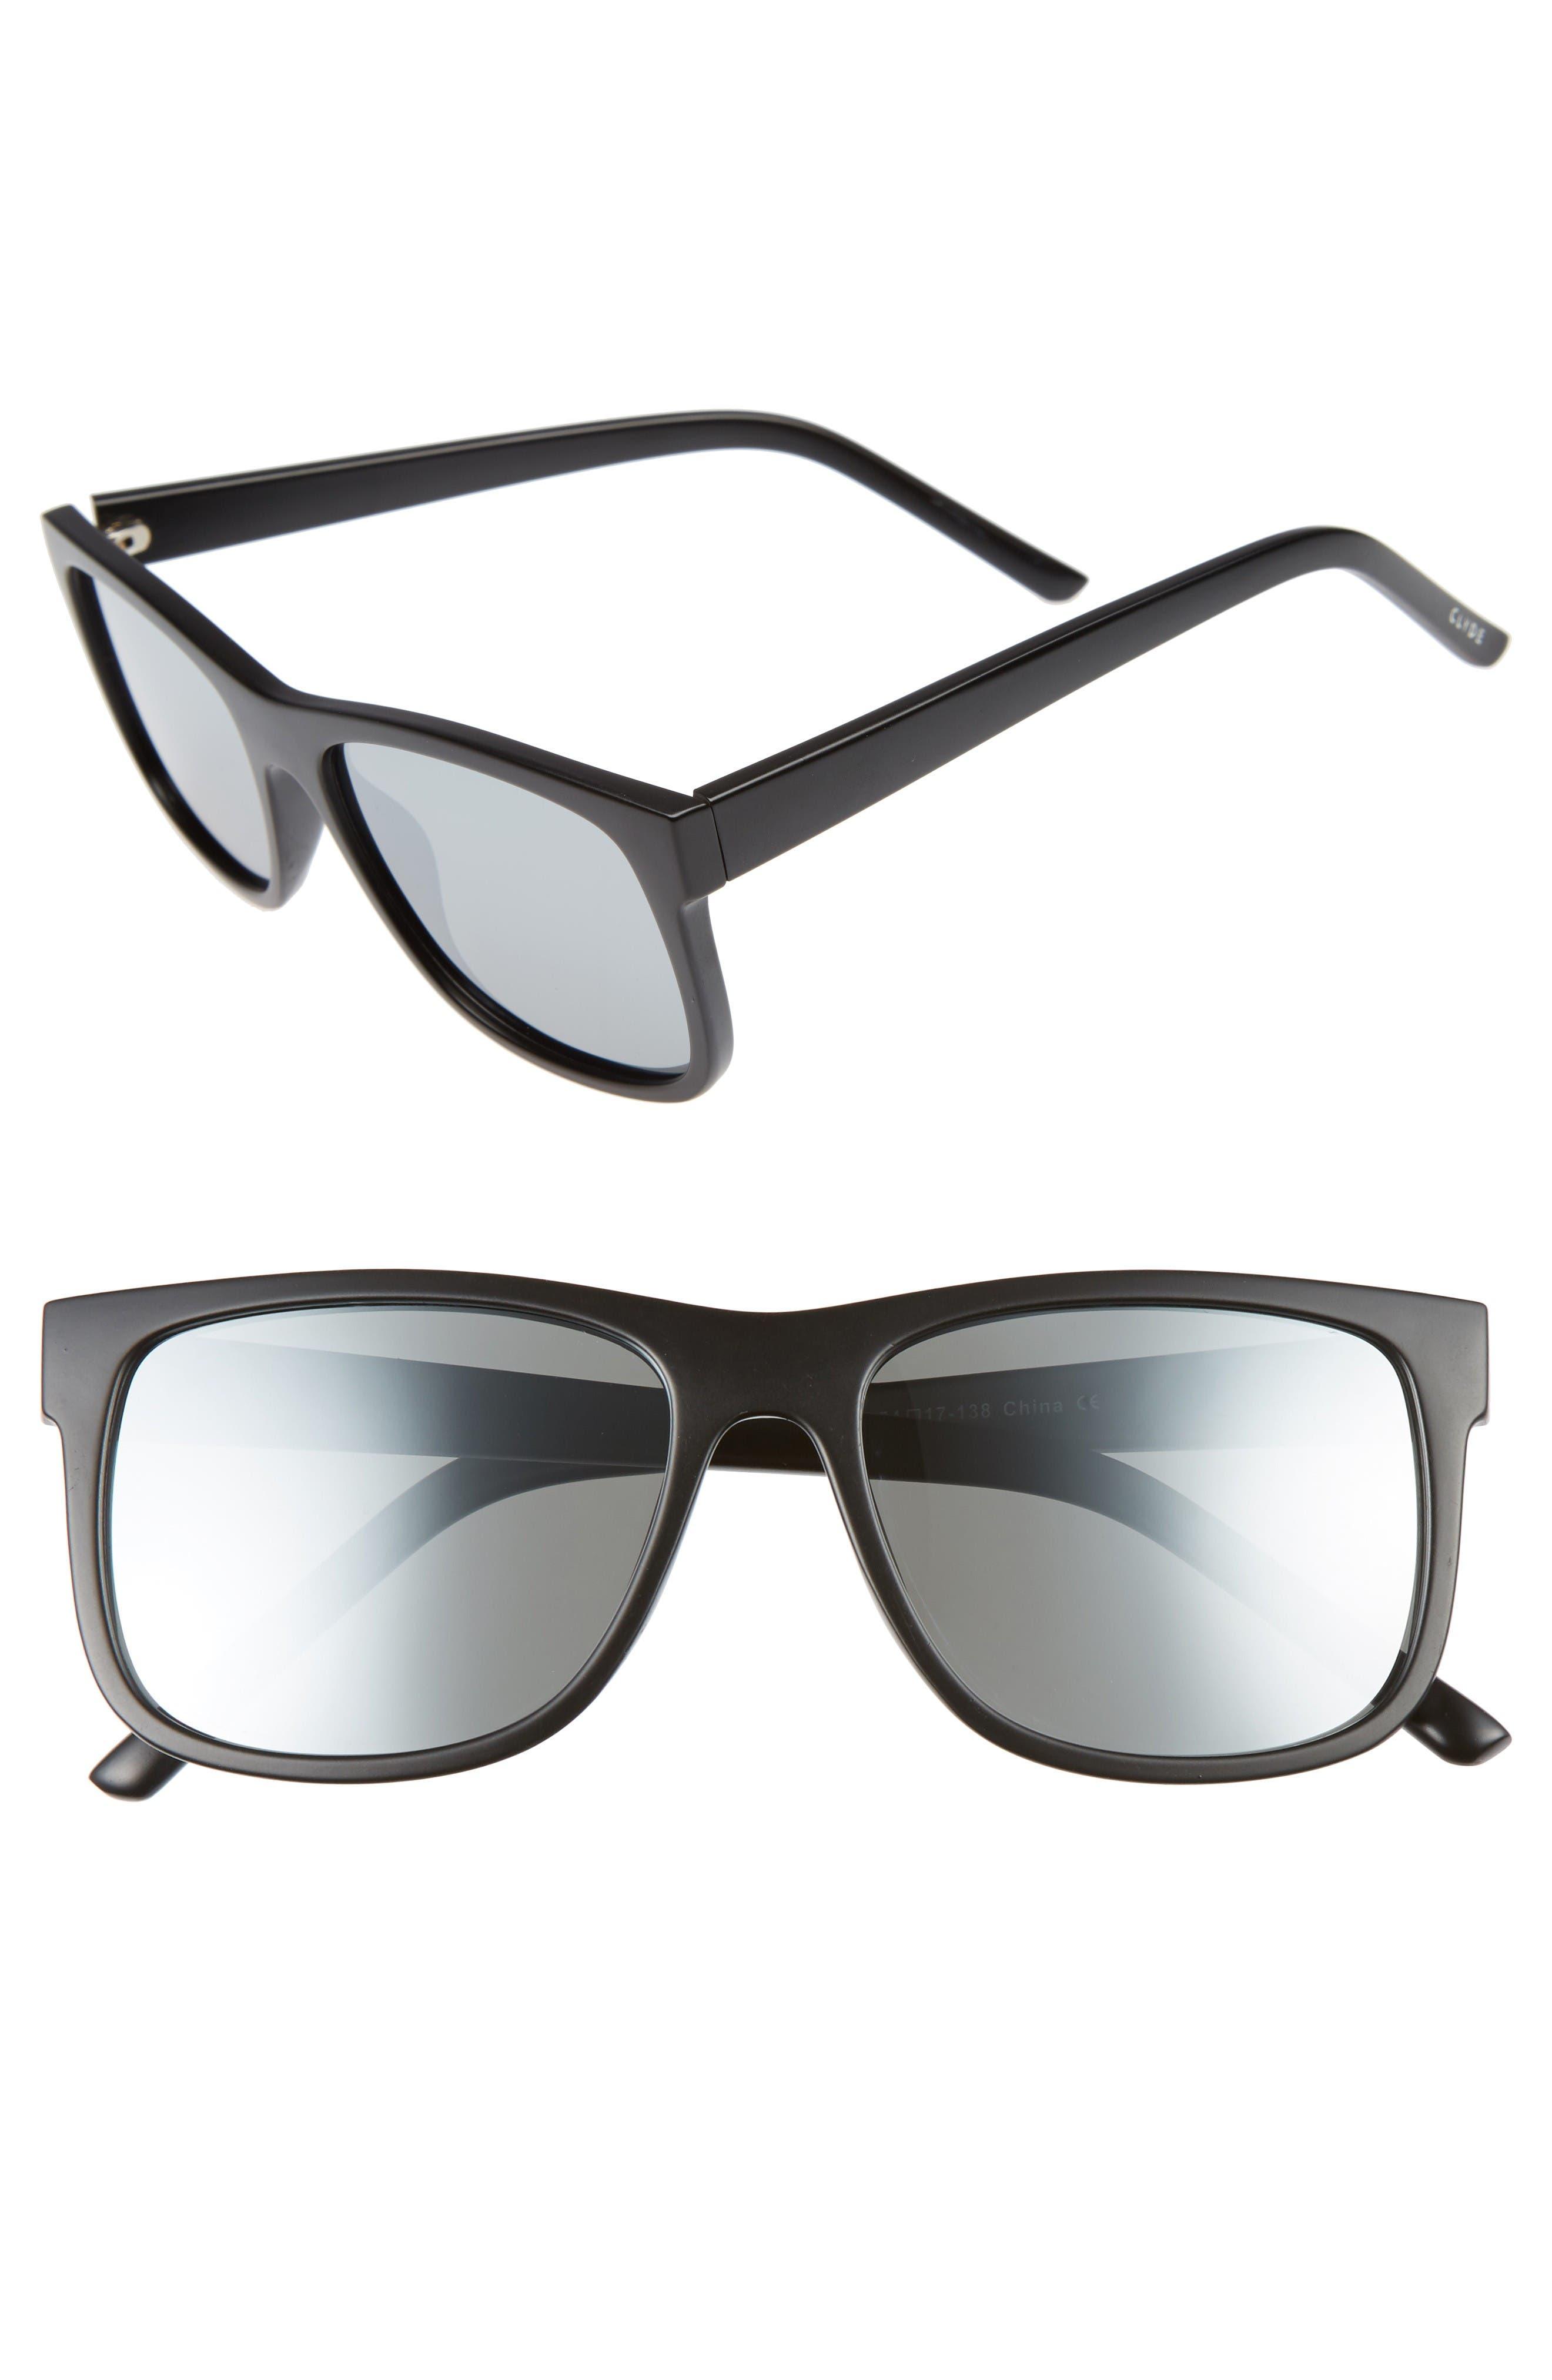 Main Image - Bonnie Clyde Main 54mm Polarized Sunglasses